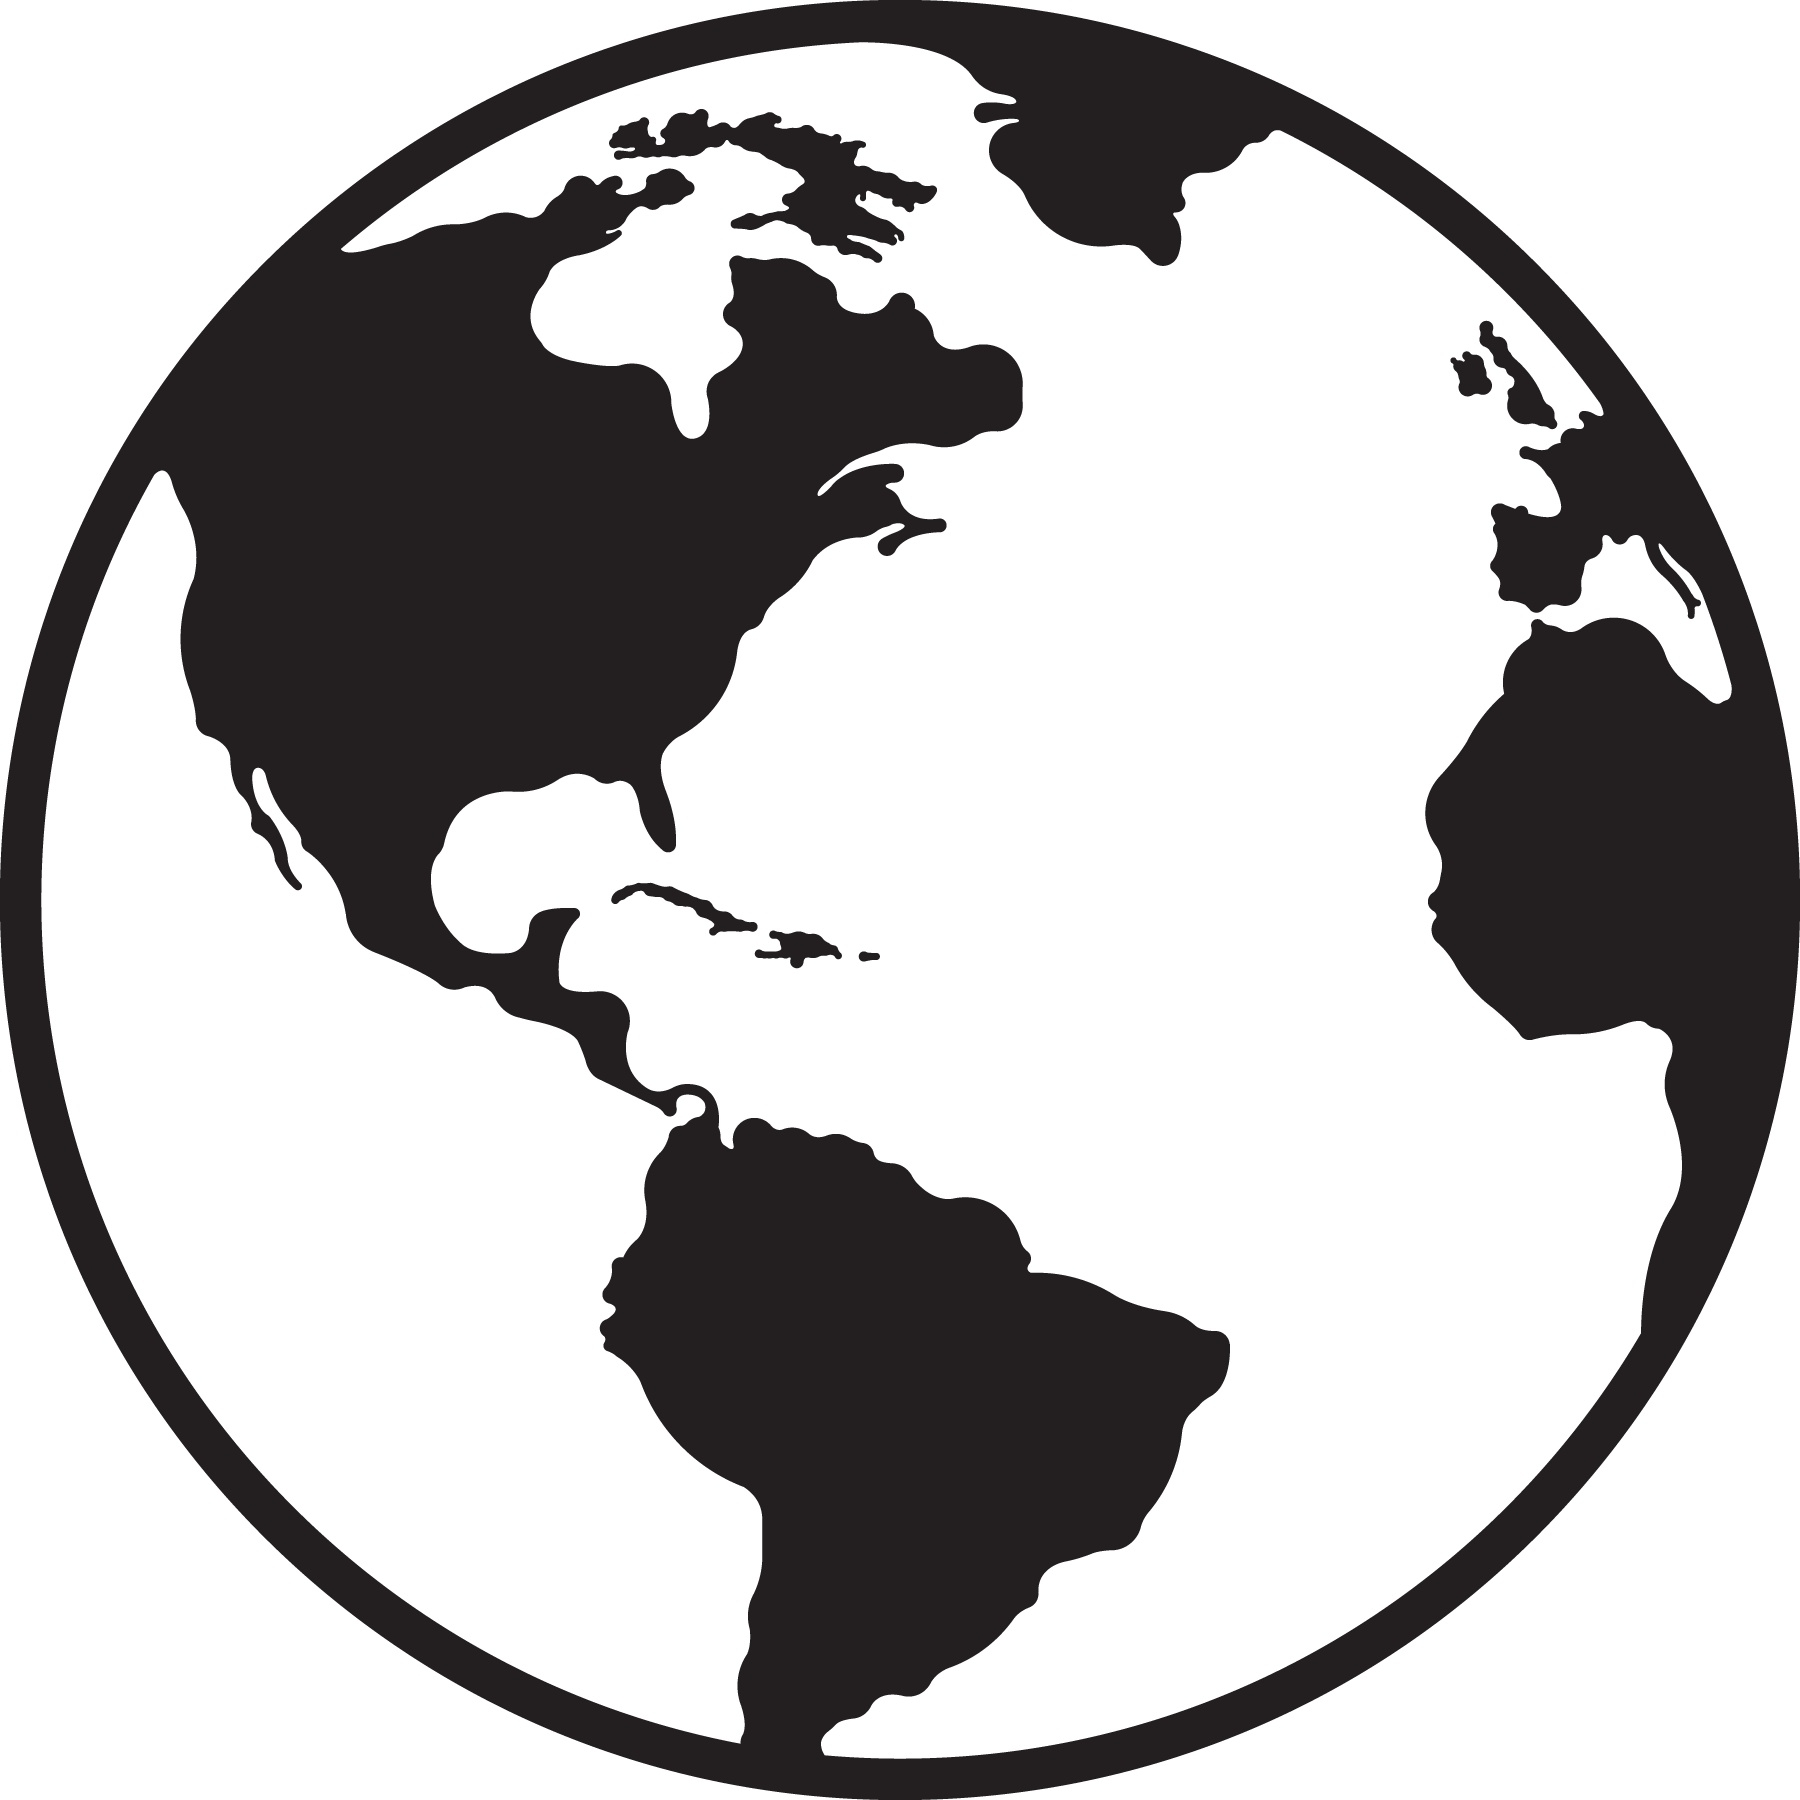 Globe clipart black and white Luxury Globe Clipart Black And White.